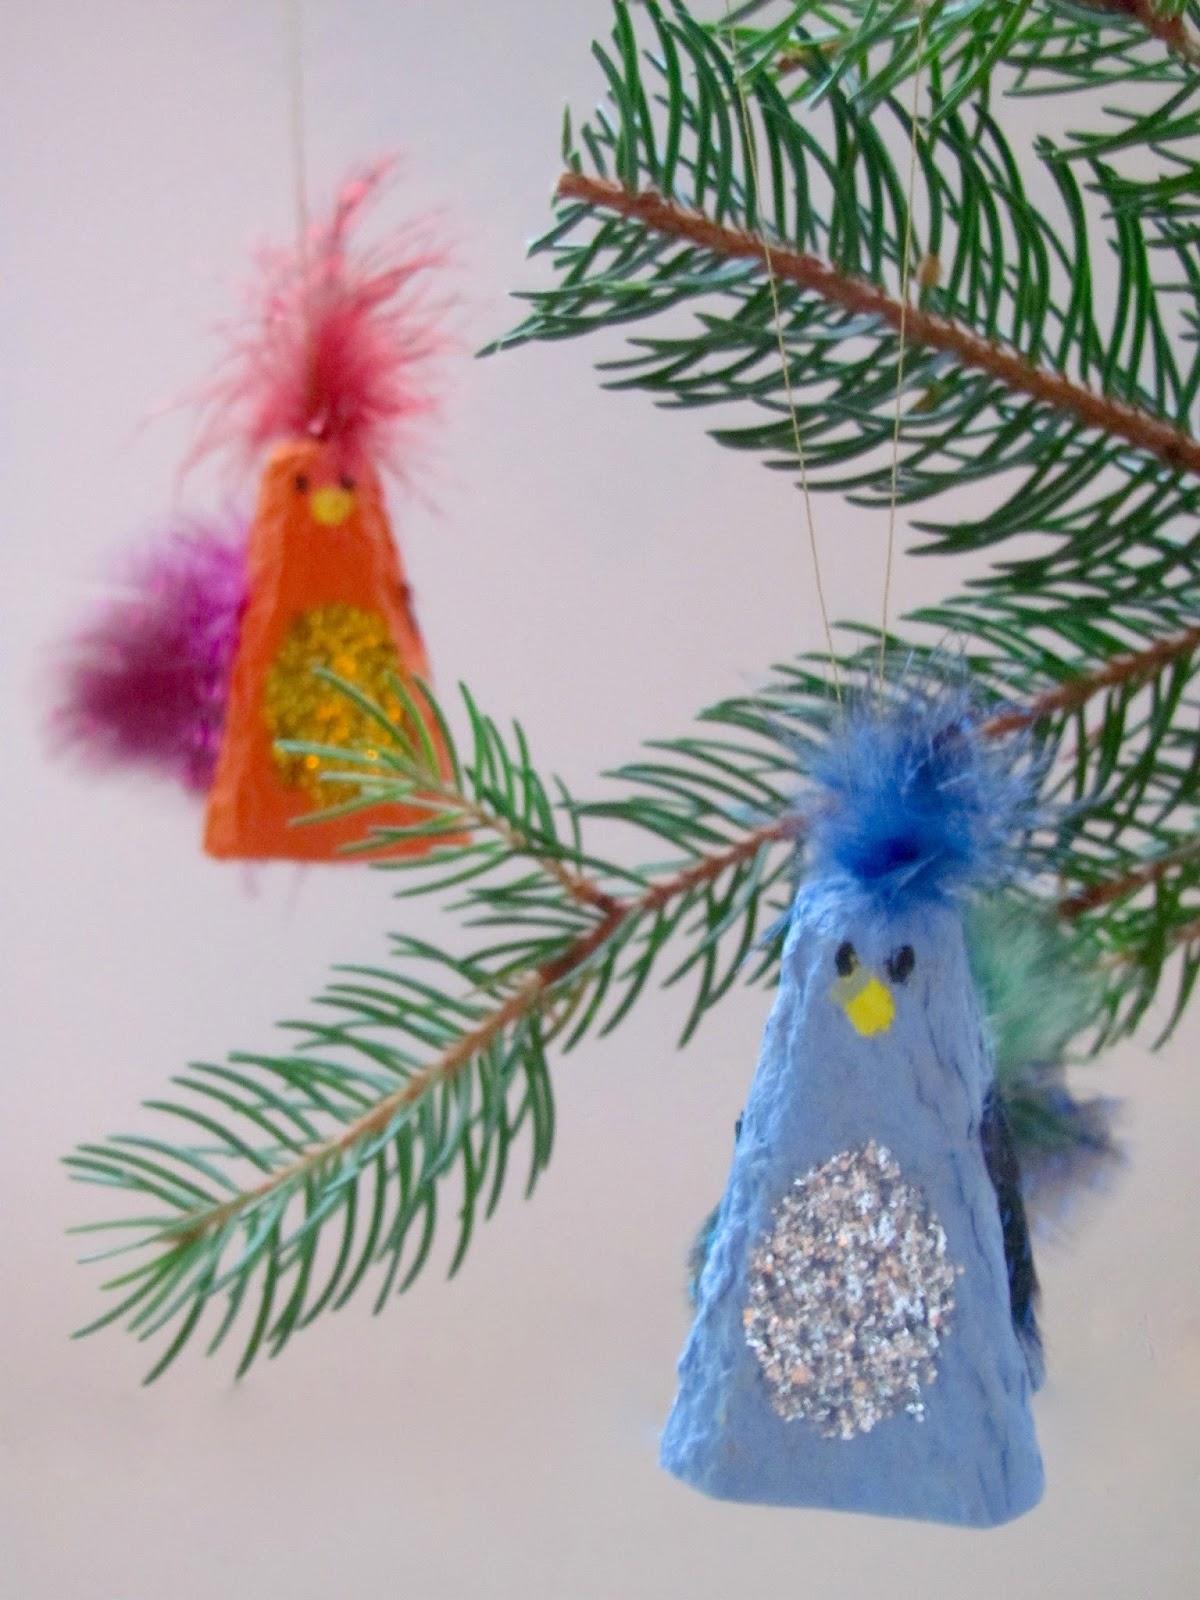 Christmas Tree Decorations Bird : Jumble tree sparkly bird decorations christmas crafts